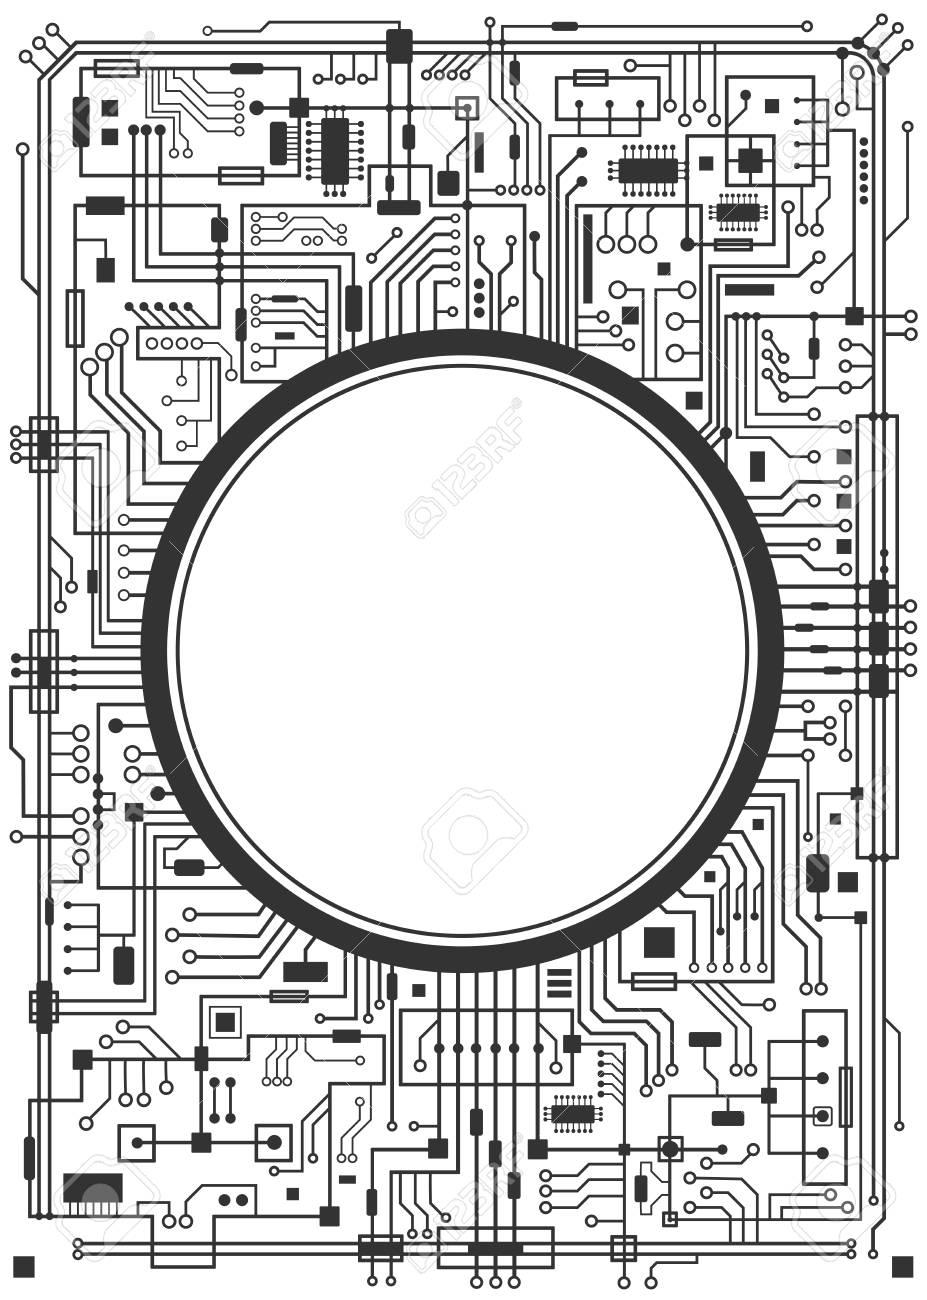 side vector circboard wiring diagram computer circuit board with copy space vector black illustration  computer circuit board with copy space